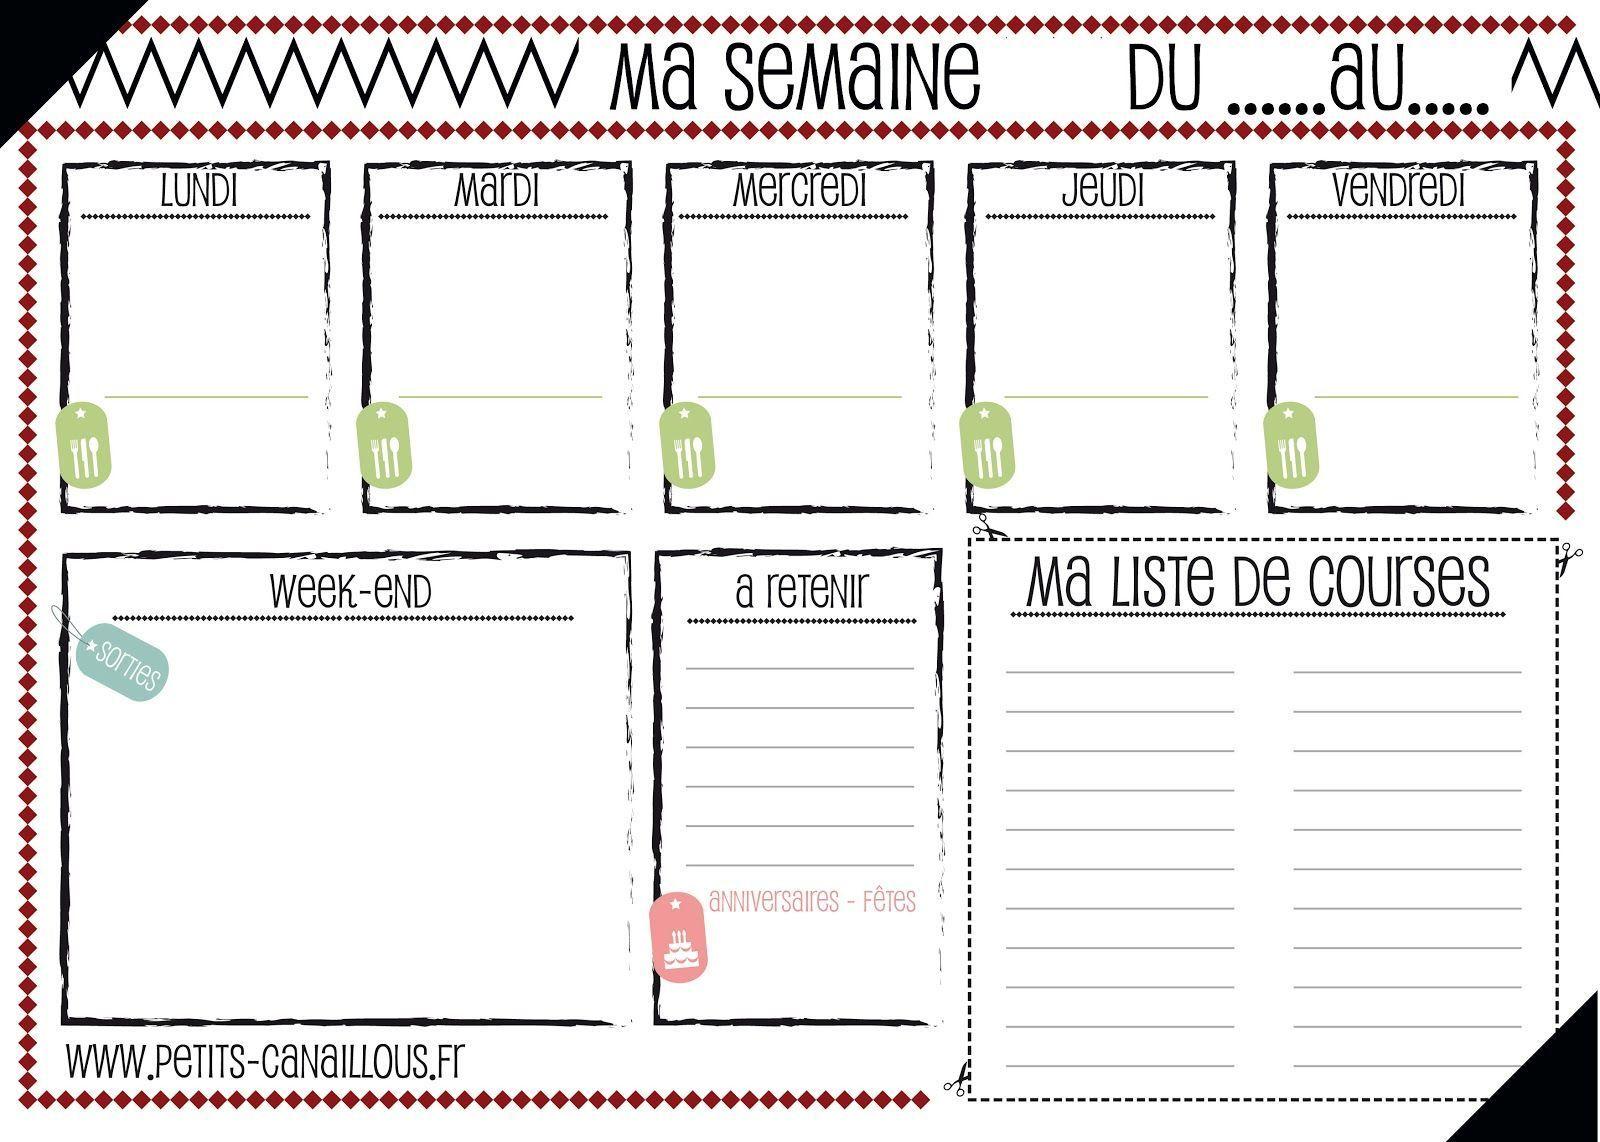 Fabuleux Repas Menu Semaine Imprimer Liste Courses Jpg 1600 1142 Oo78 Planning Vierge Modeles De Menu Menu Semaine